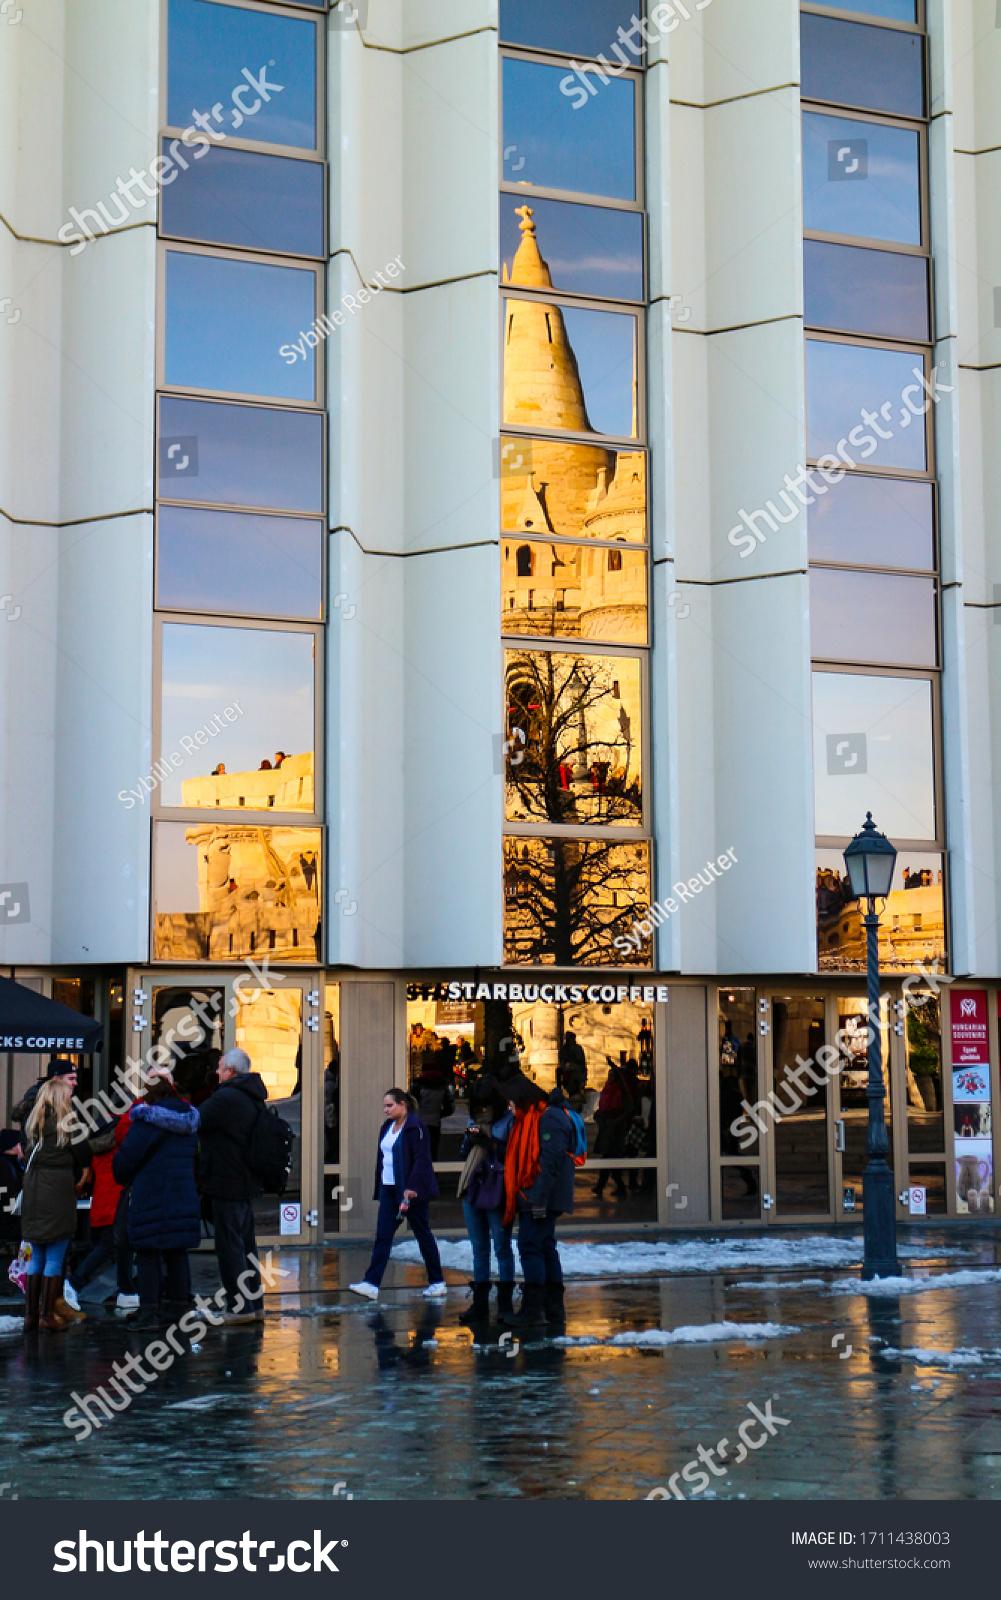 stock-photo-budapest-hungary-december-fi